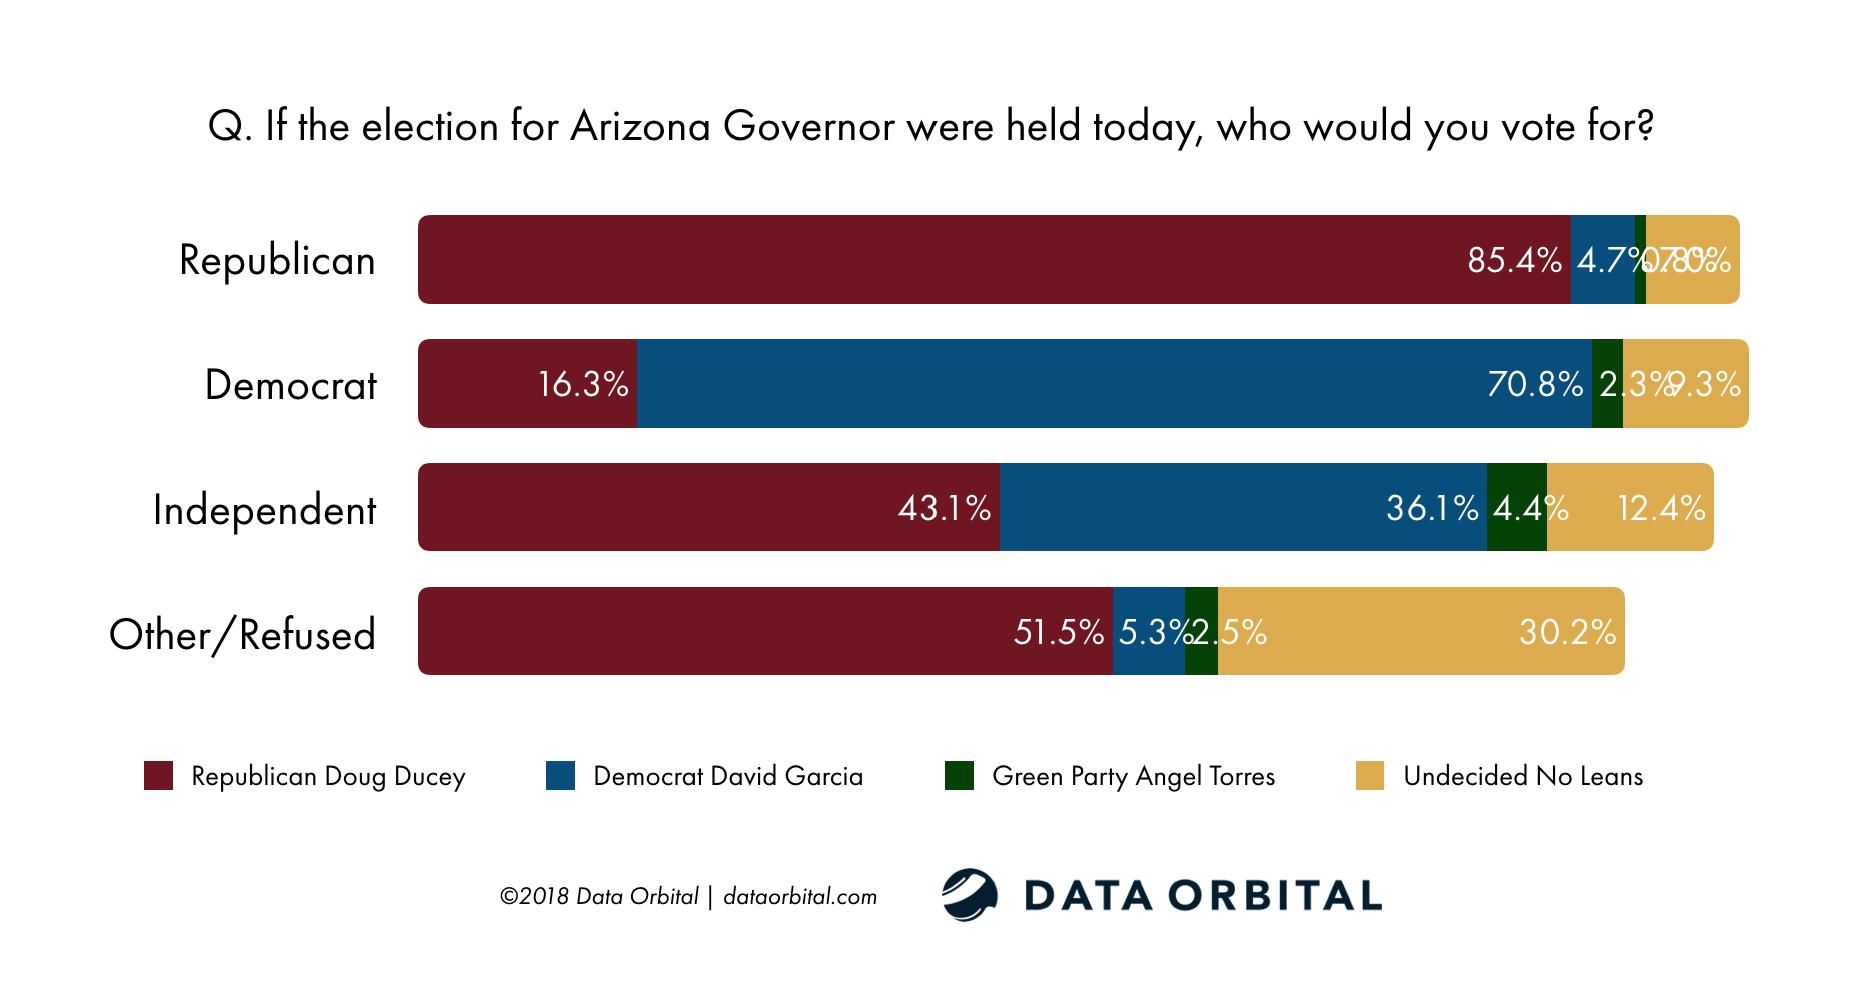 AZ Statewide Survey October 2018 Data Orbital Gubernatorial Race by Party